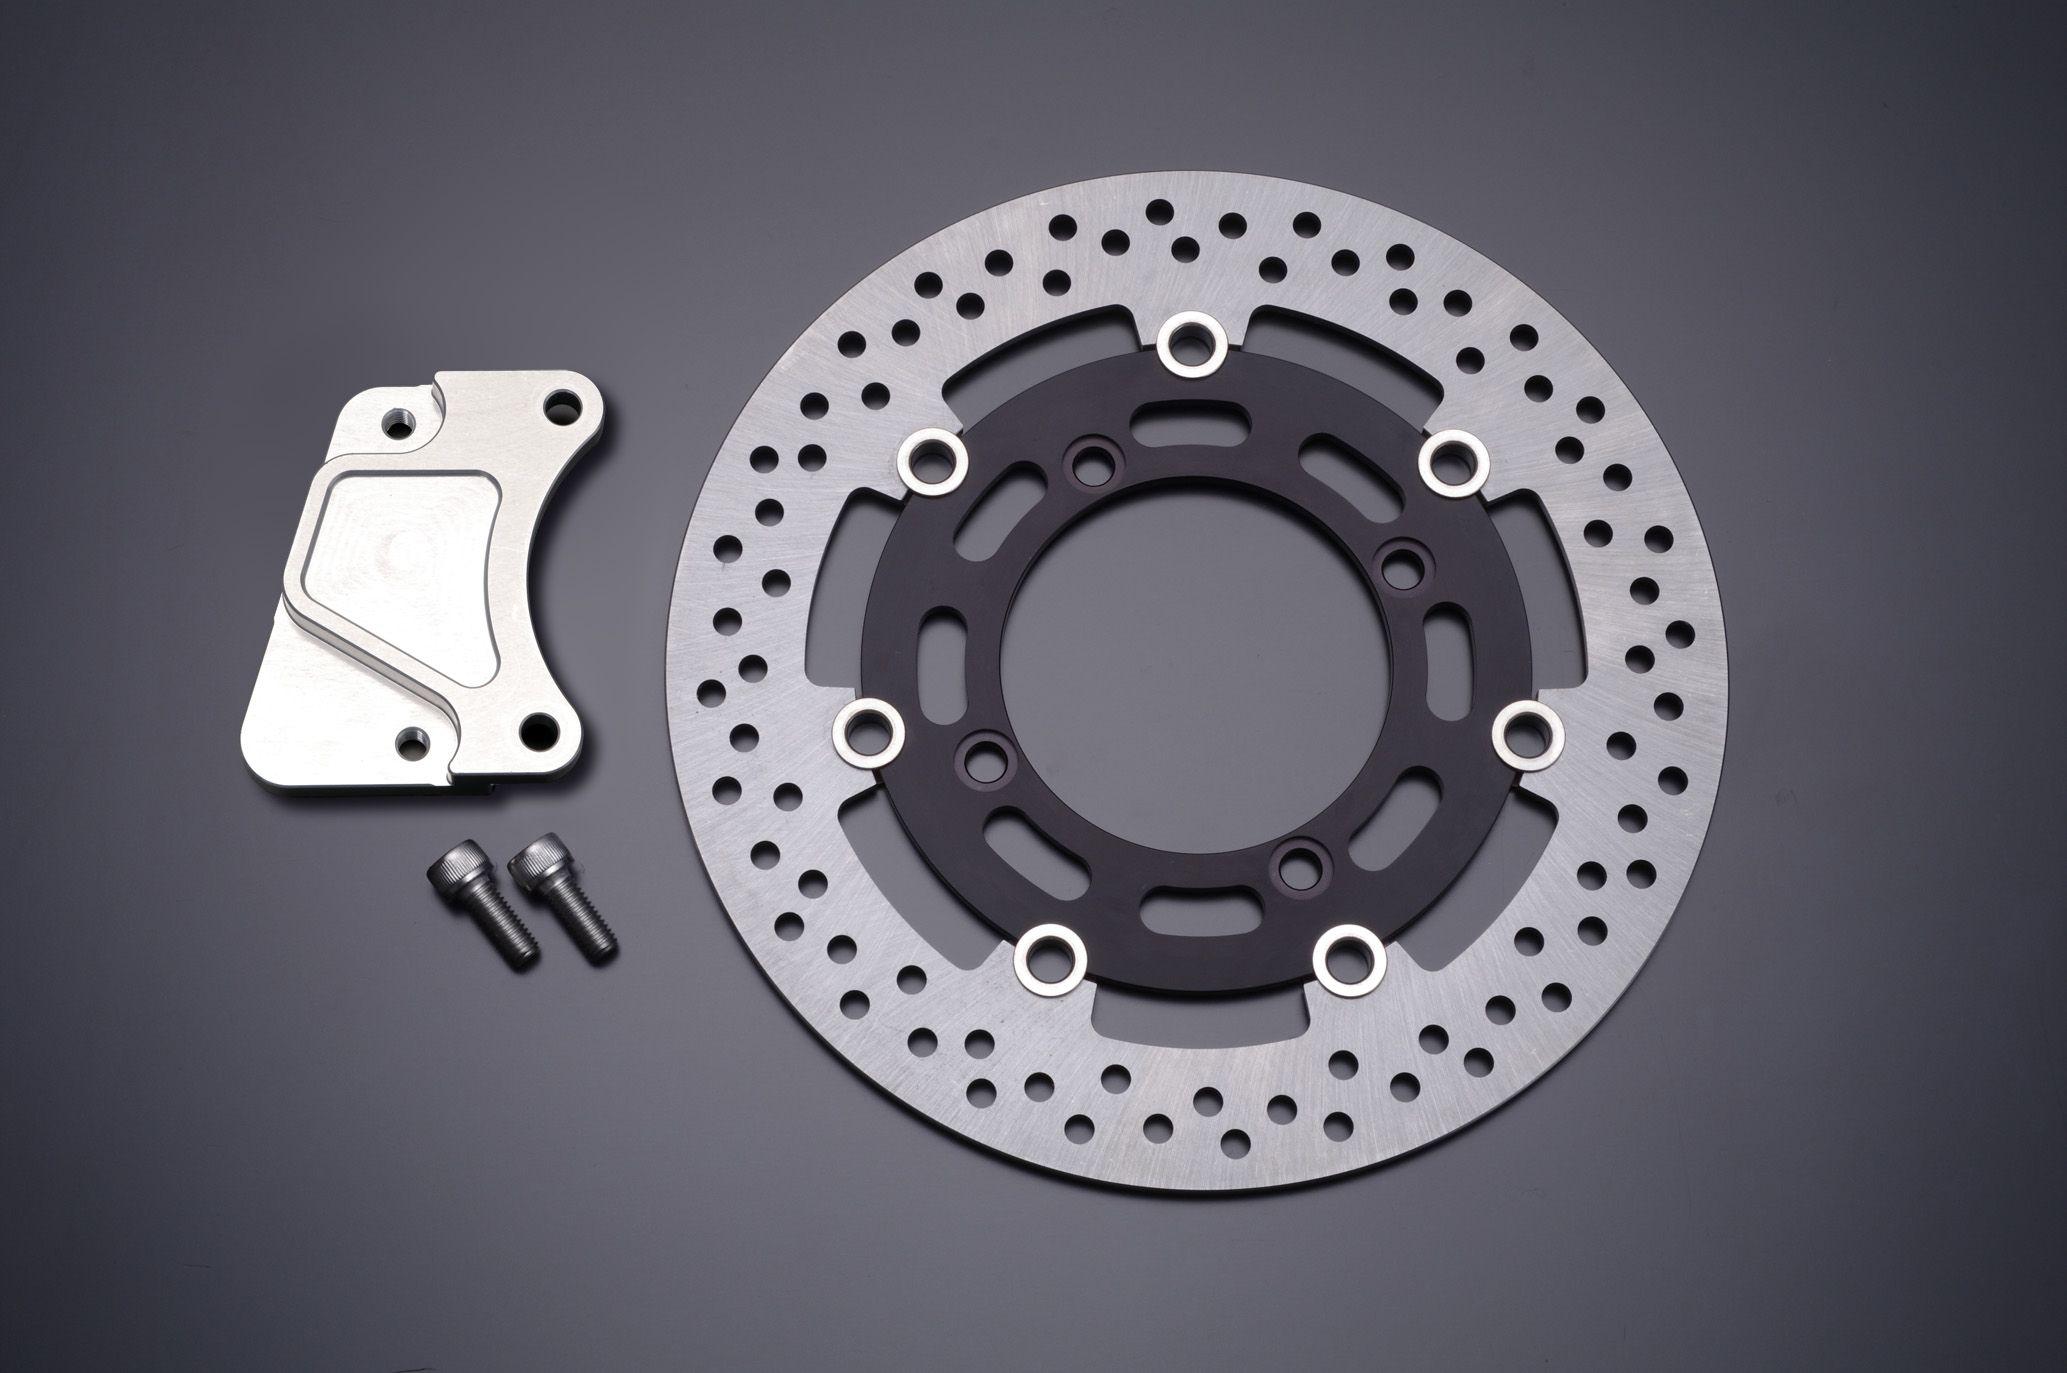 【GRONDEMENT】Φ285 煞車碟盤套件 一般型卡鉗用 (黑色) - 「Webike-摩托百貨」